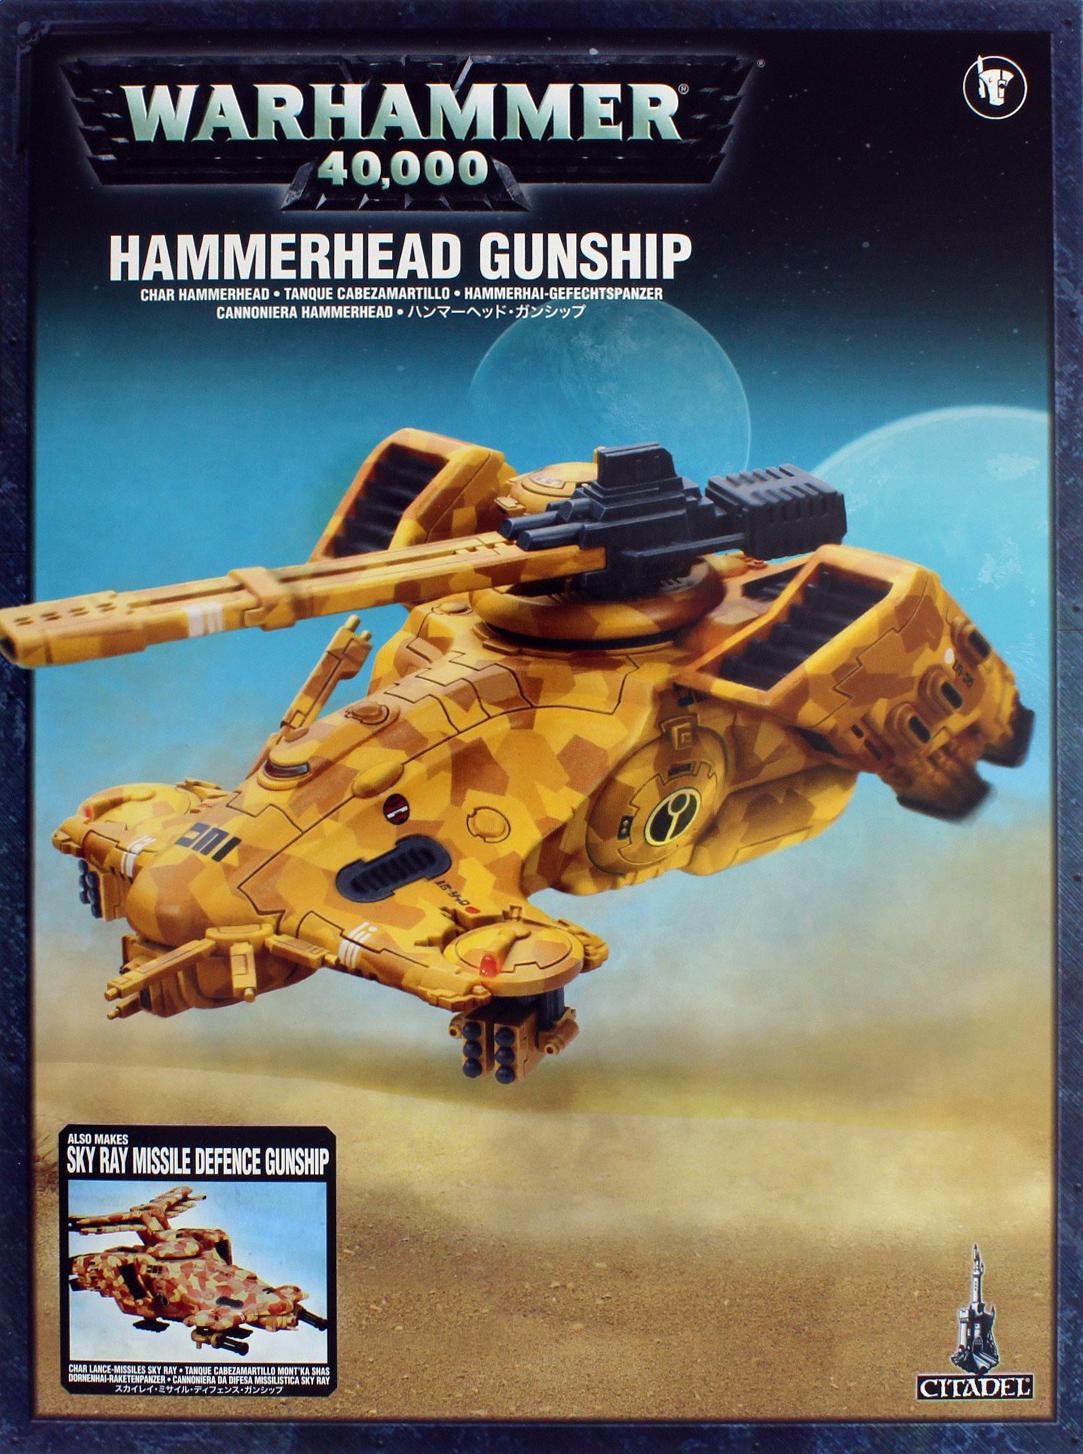 Warhammer 40,000 Tau Hammerhead/Sky Ray image